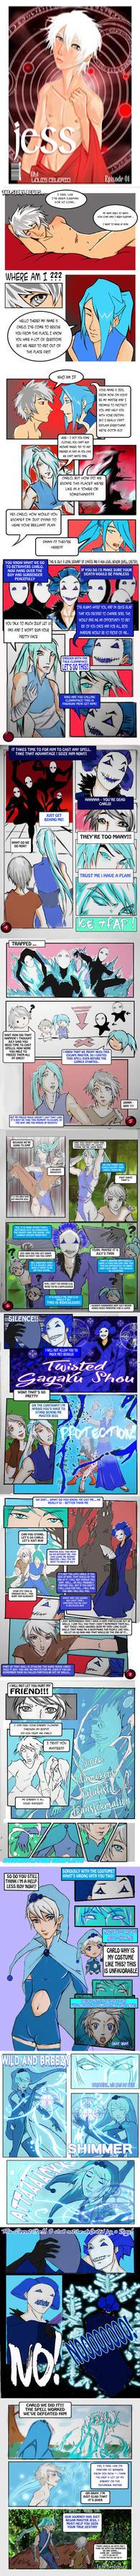 Jess Comics Episode 1 by miserysong